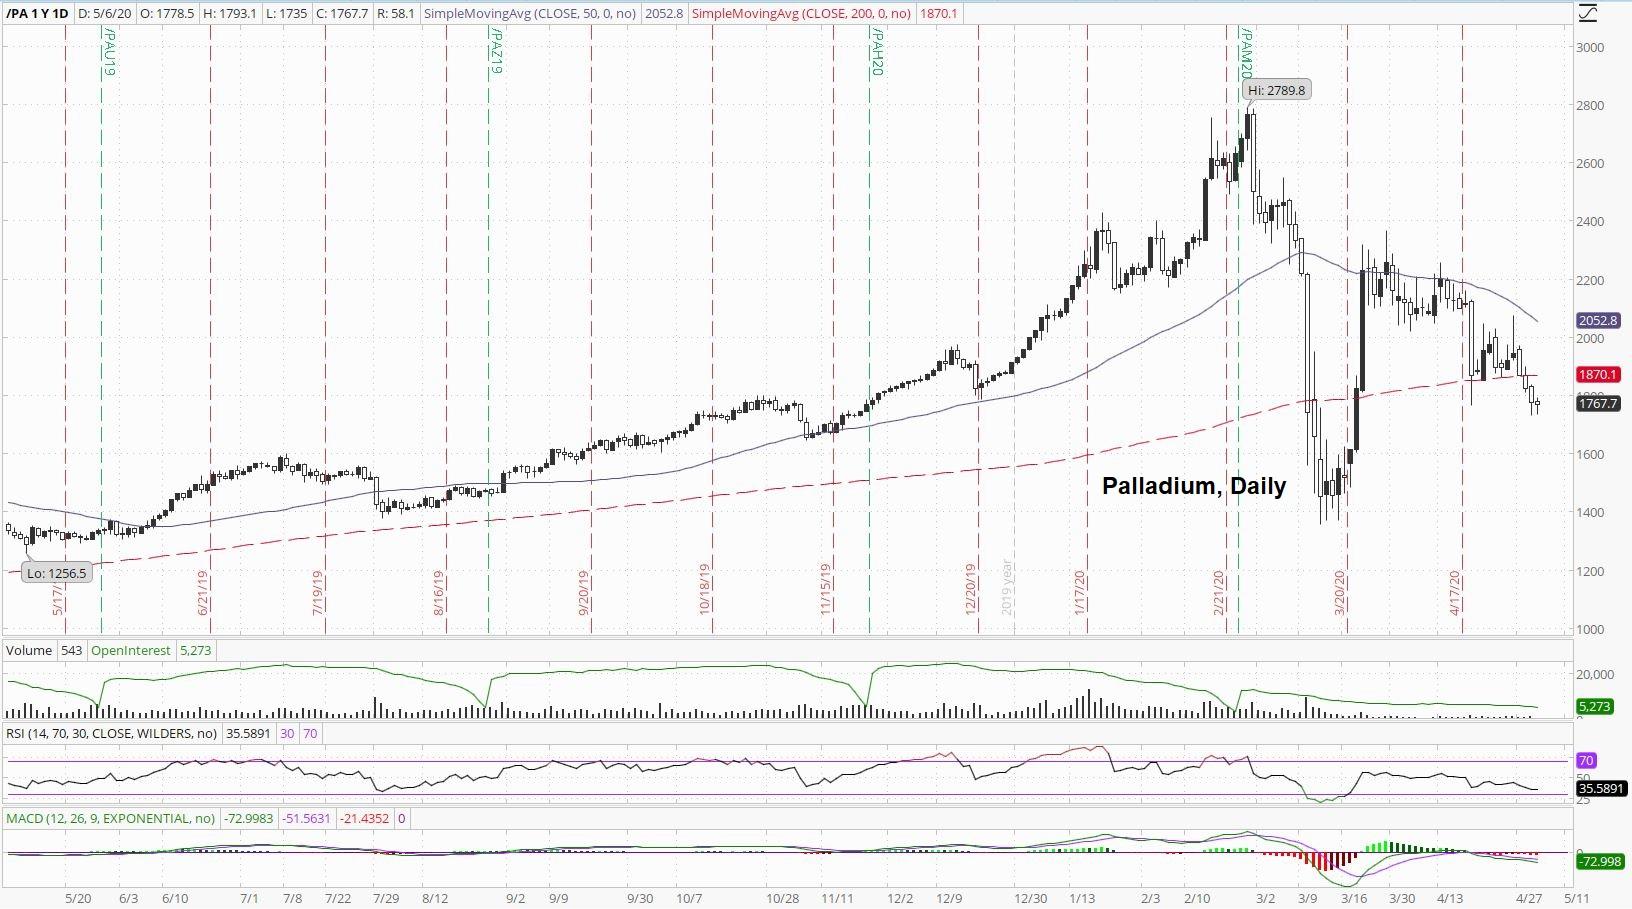 Palladium Daily Price